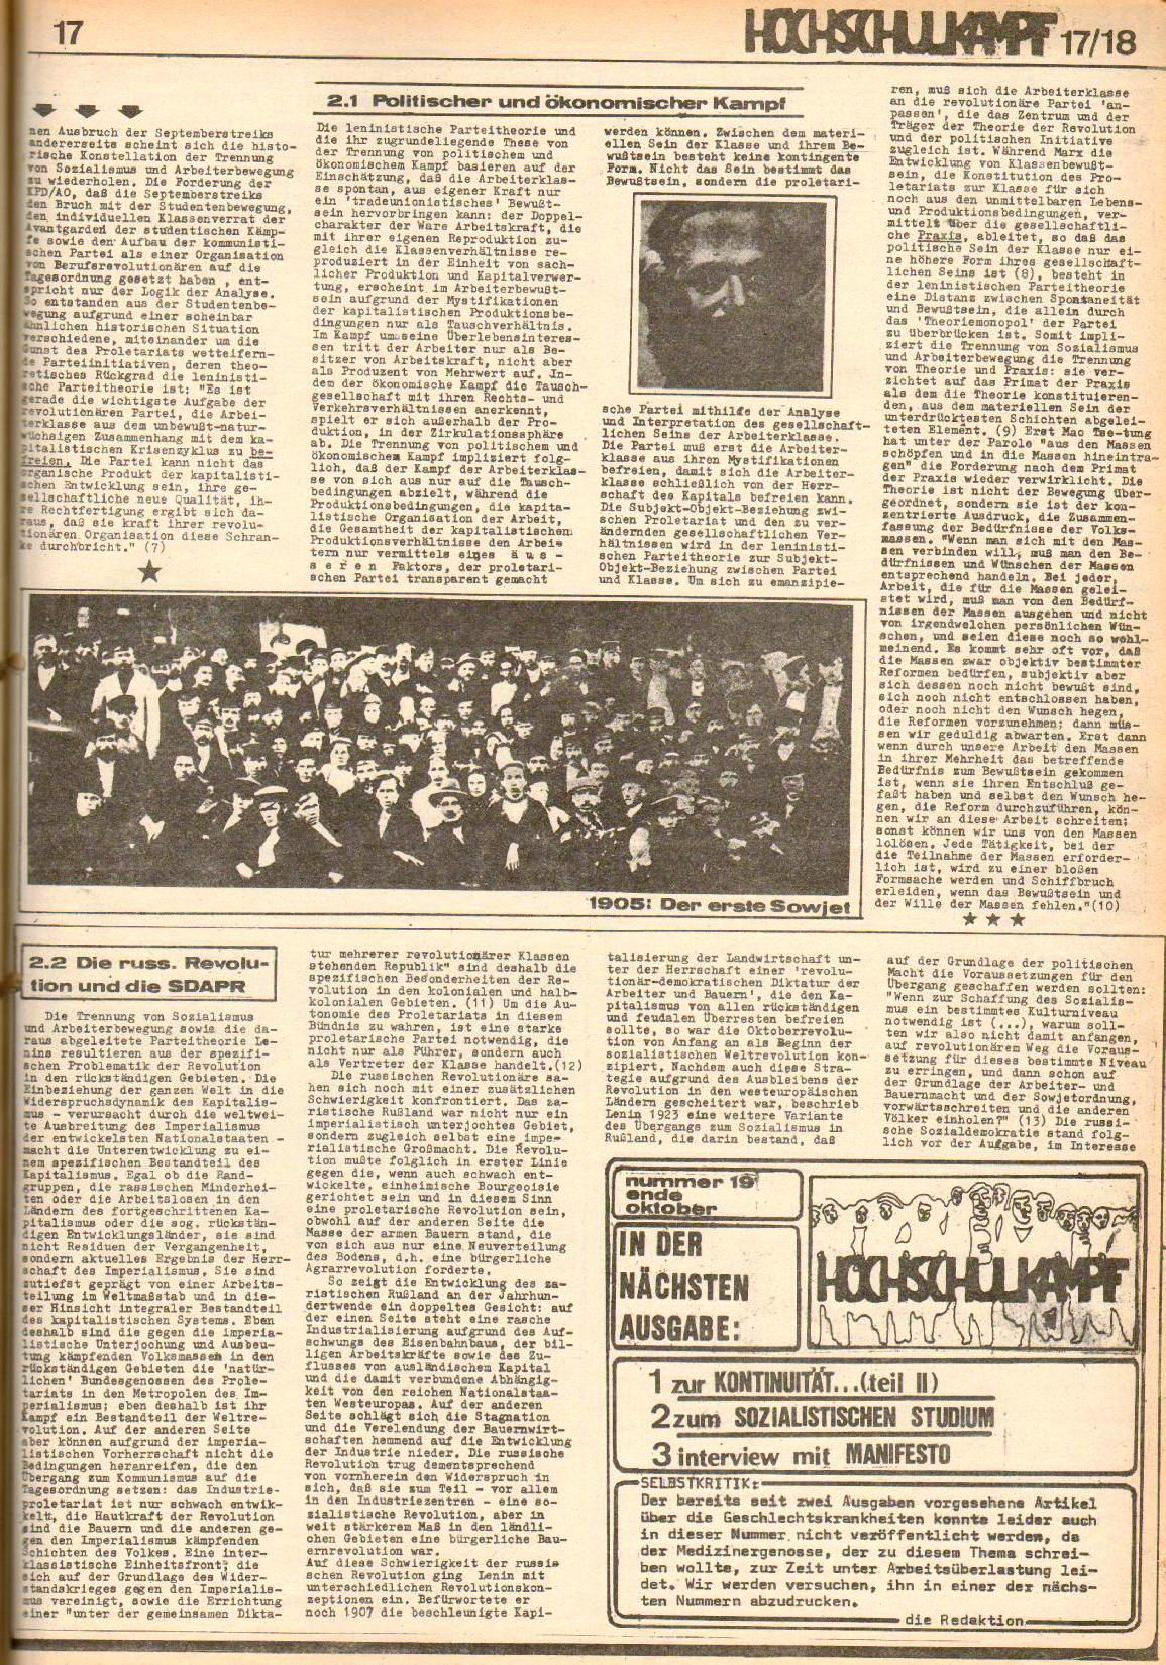 Berlin_Hochschulkampf_1971_17_17